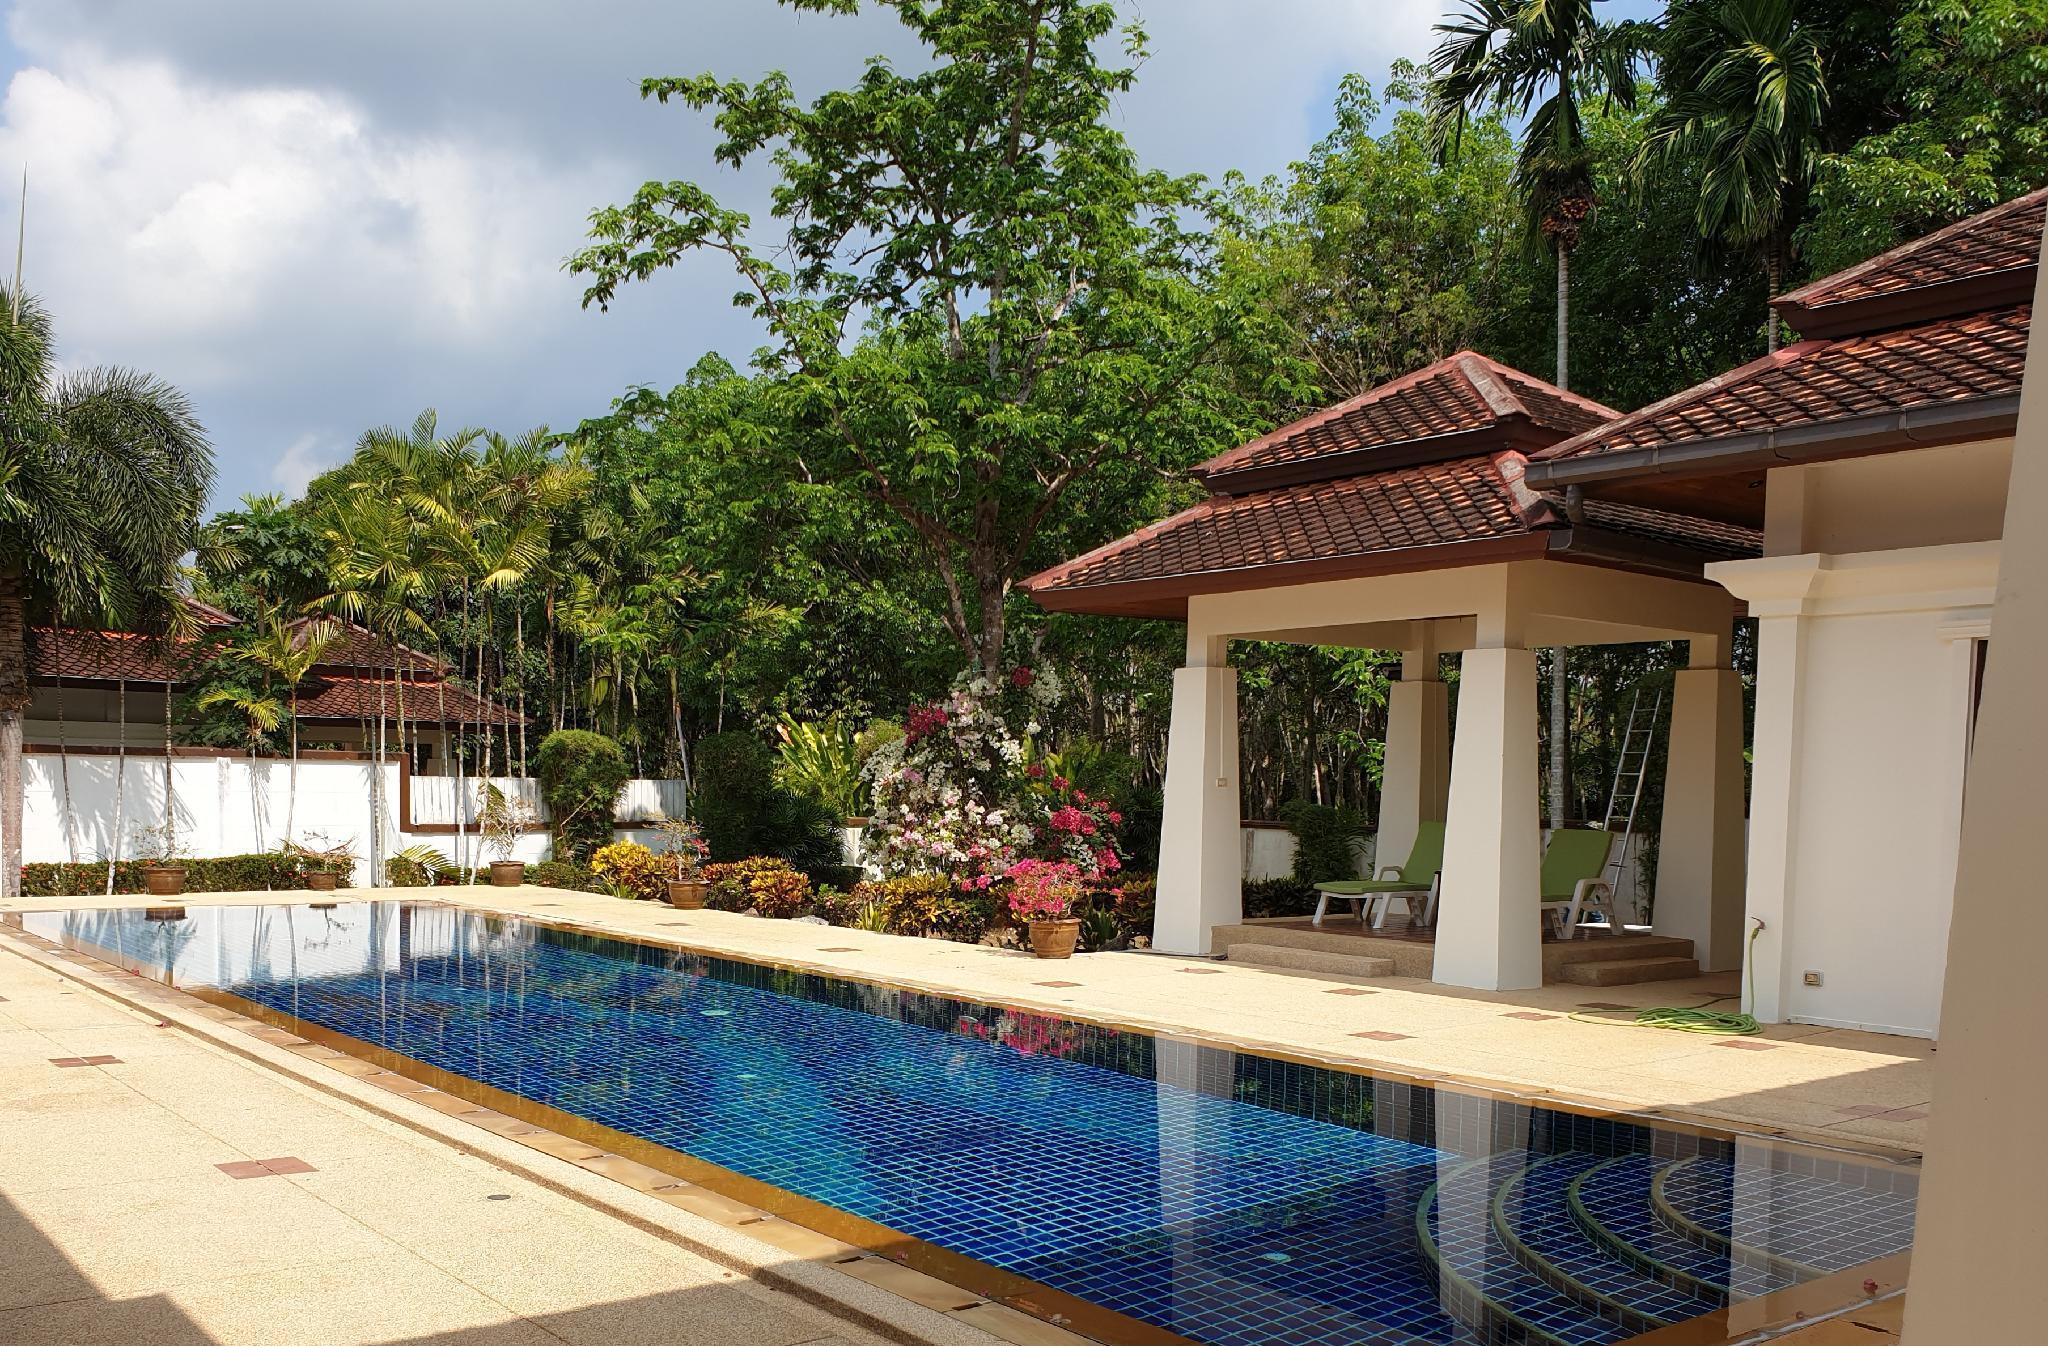 Garden Villas   A Luxury Oasis